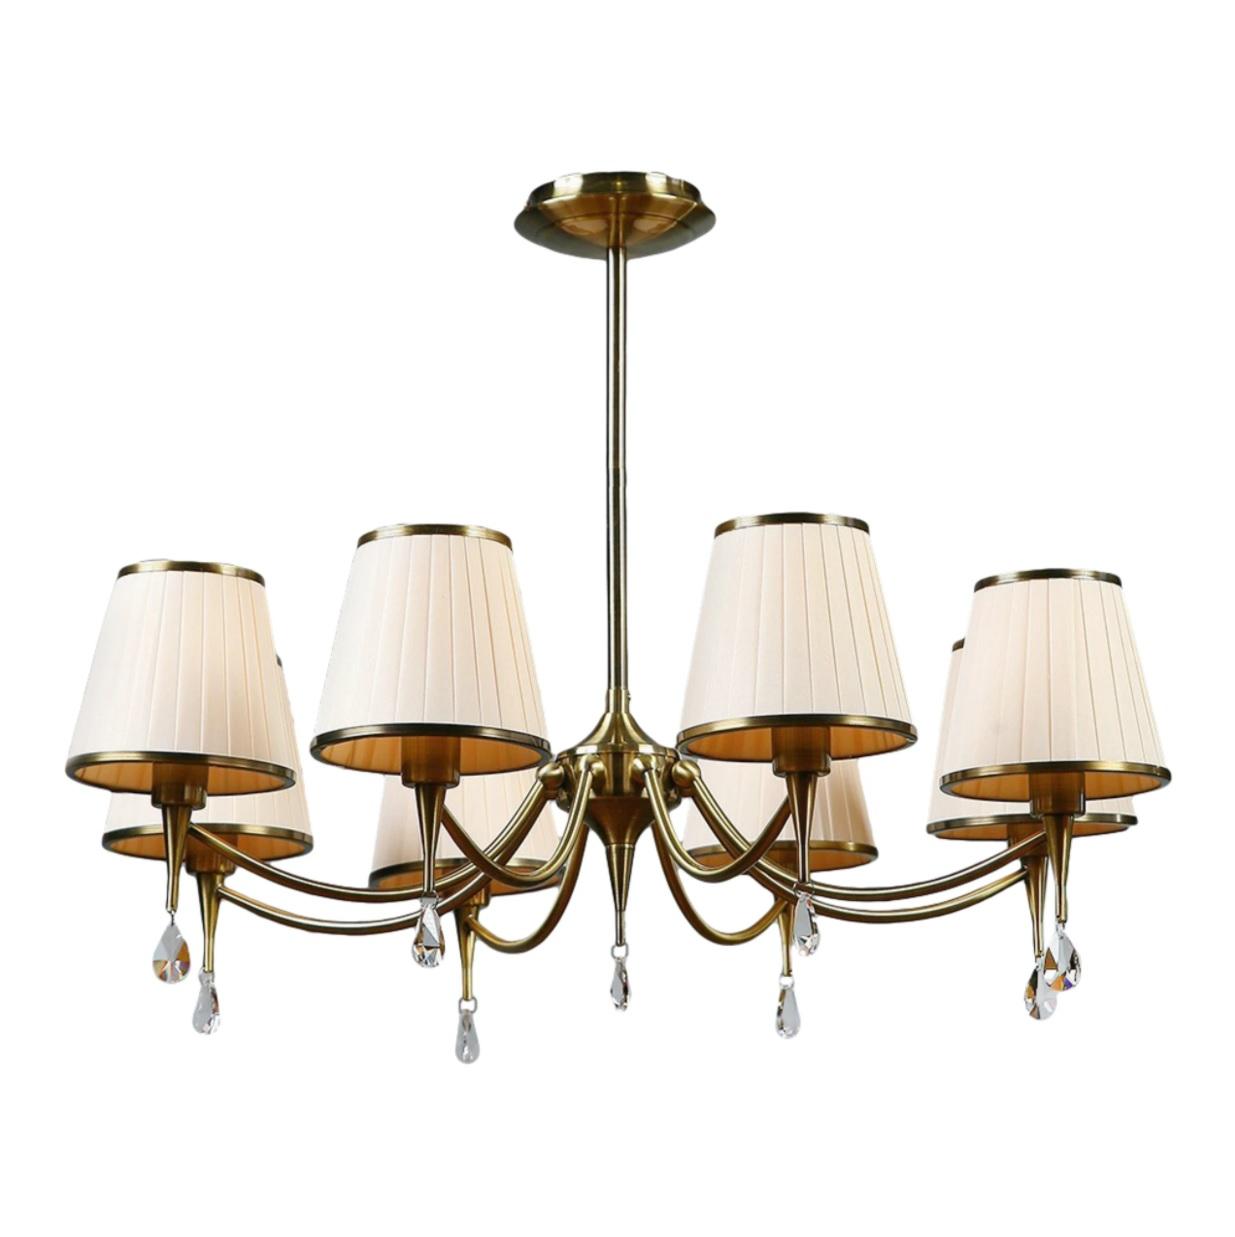 Люстра Brizzi ma 01625ca/008 bronze cream настольная лампа brizzi ma 01625t 001 bronze cream